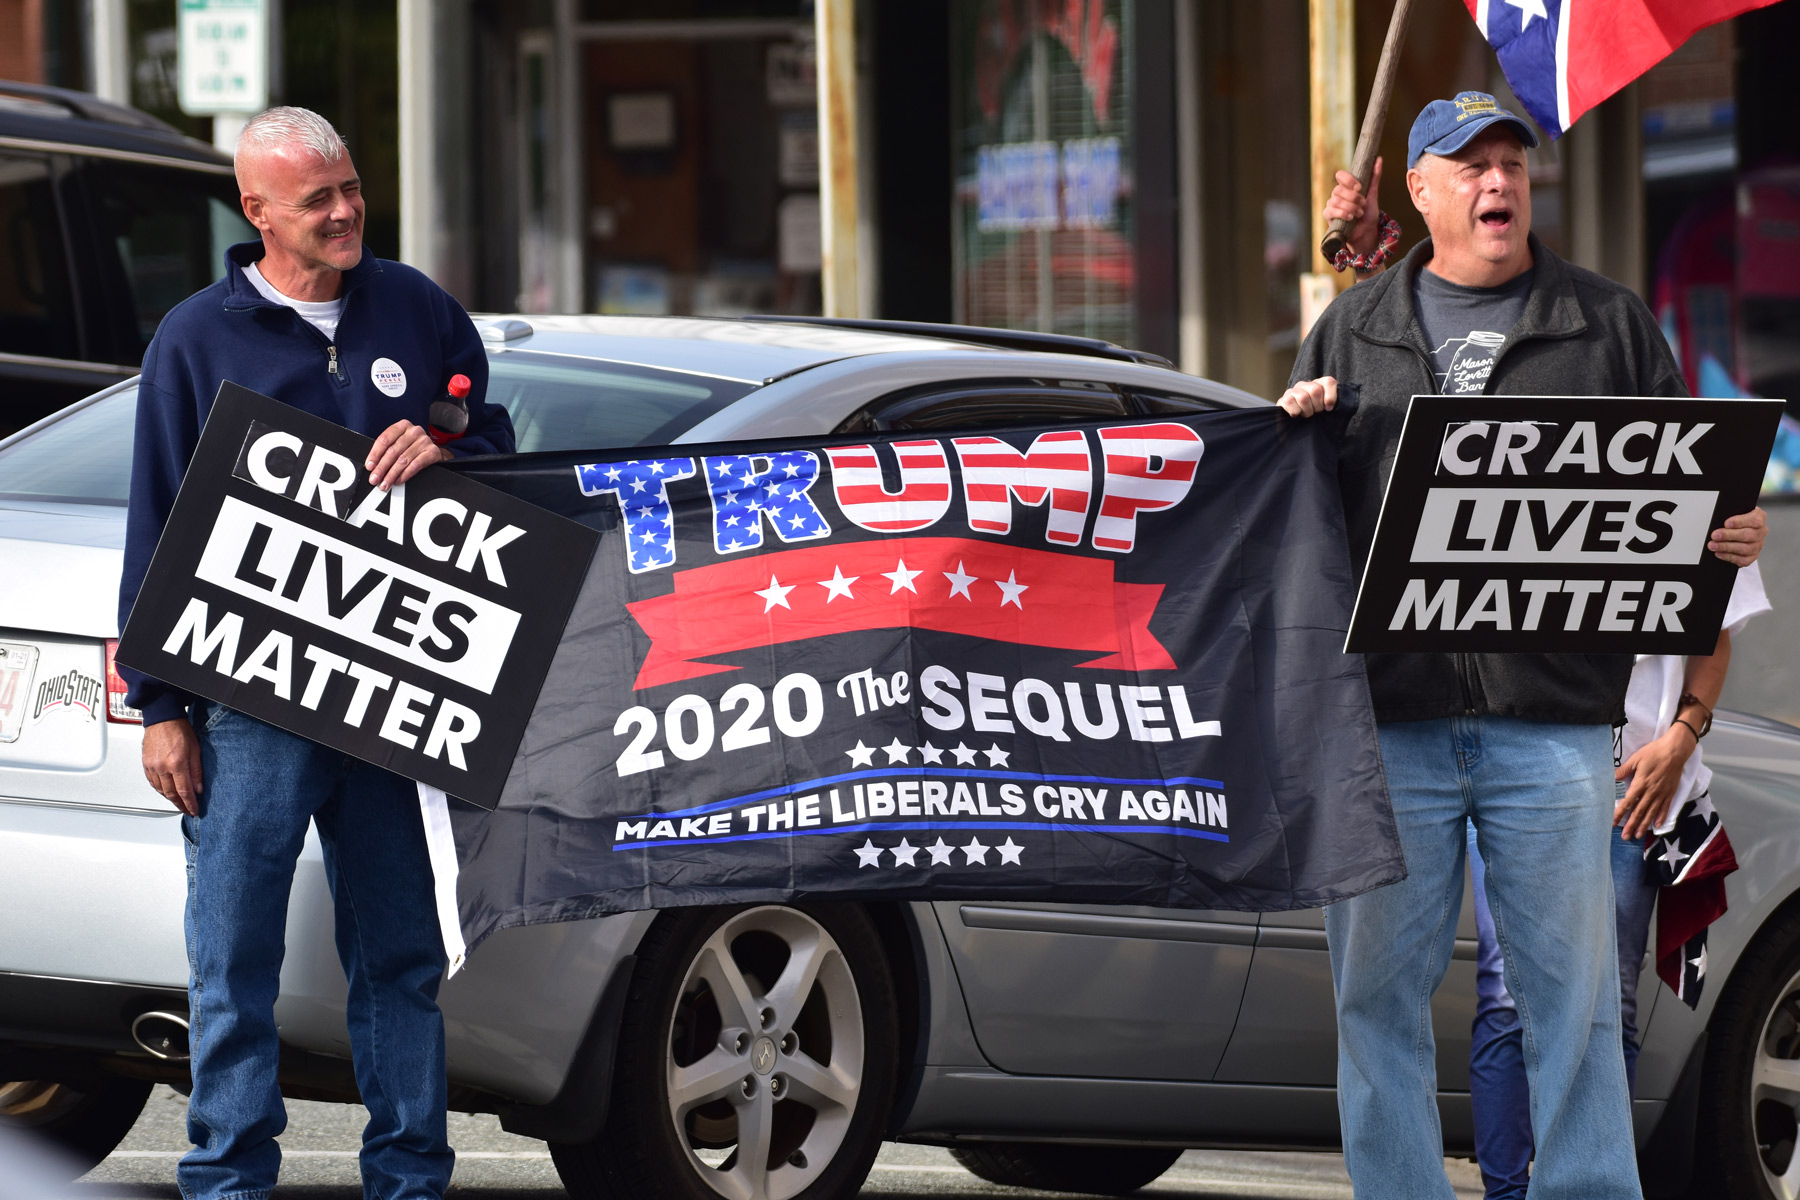 Pro-Trump demonstrators in Alamance County, N.C.